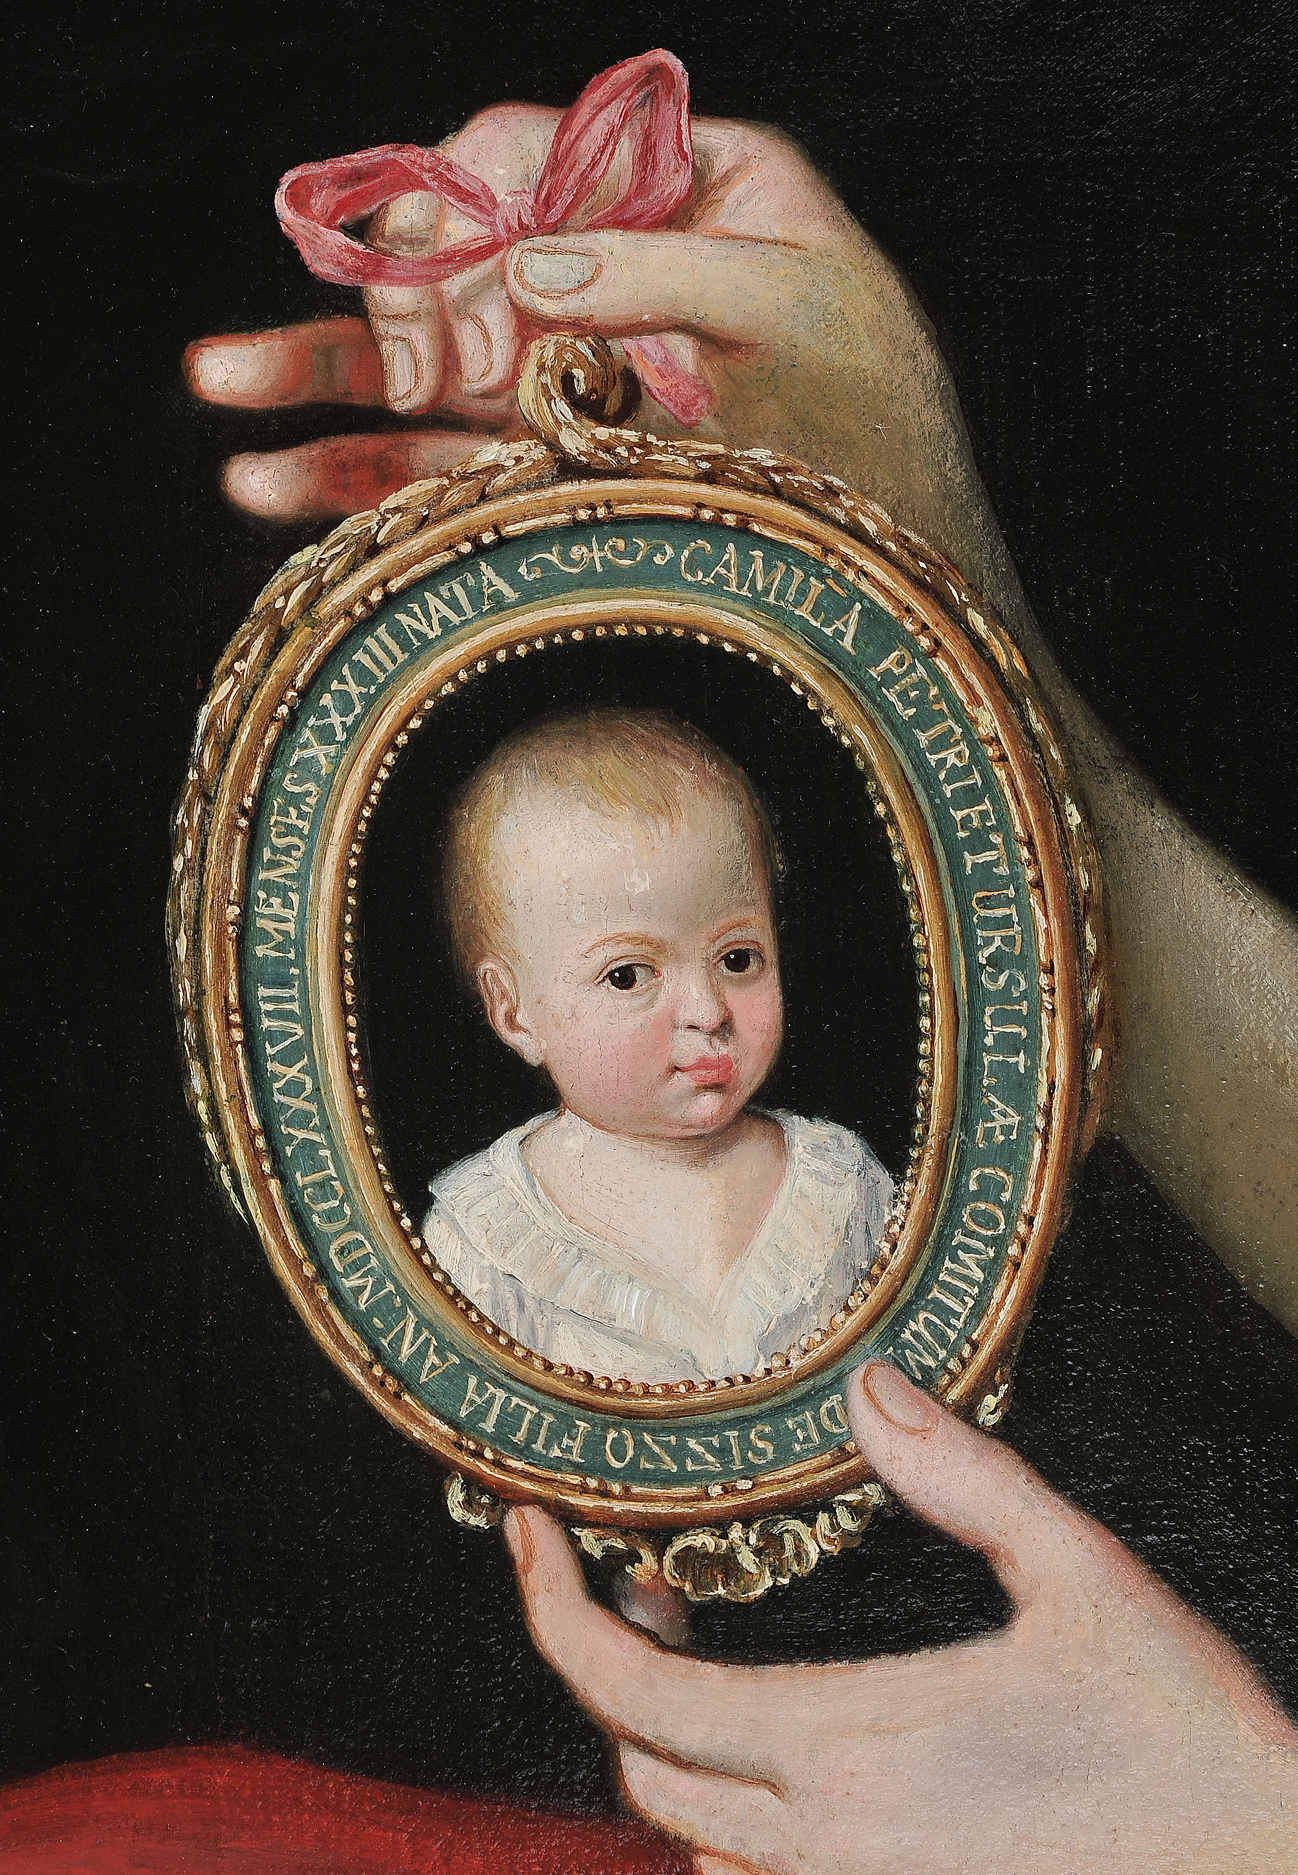 Adeliges Portraitgemälde, Italien oder Donaumonarchie - Image 3 of 5